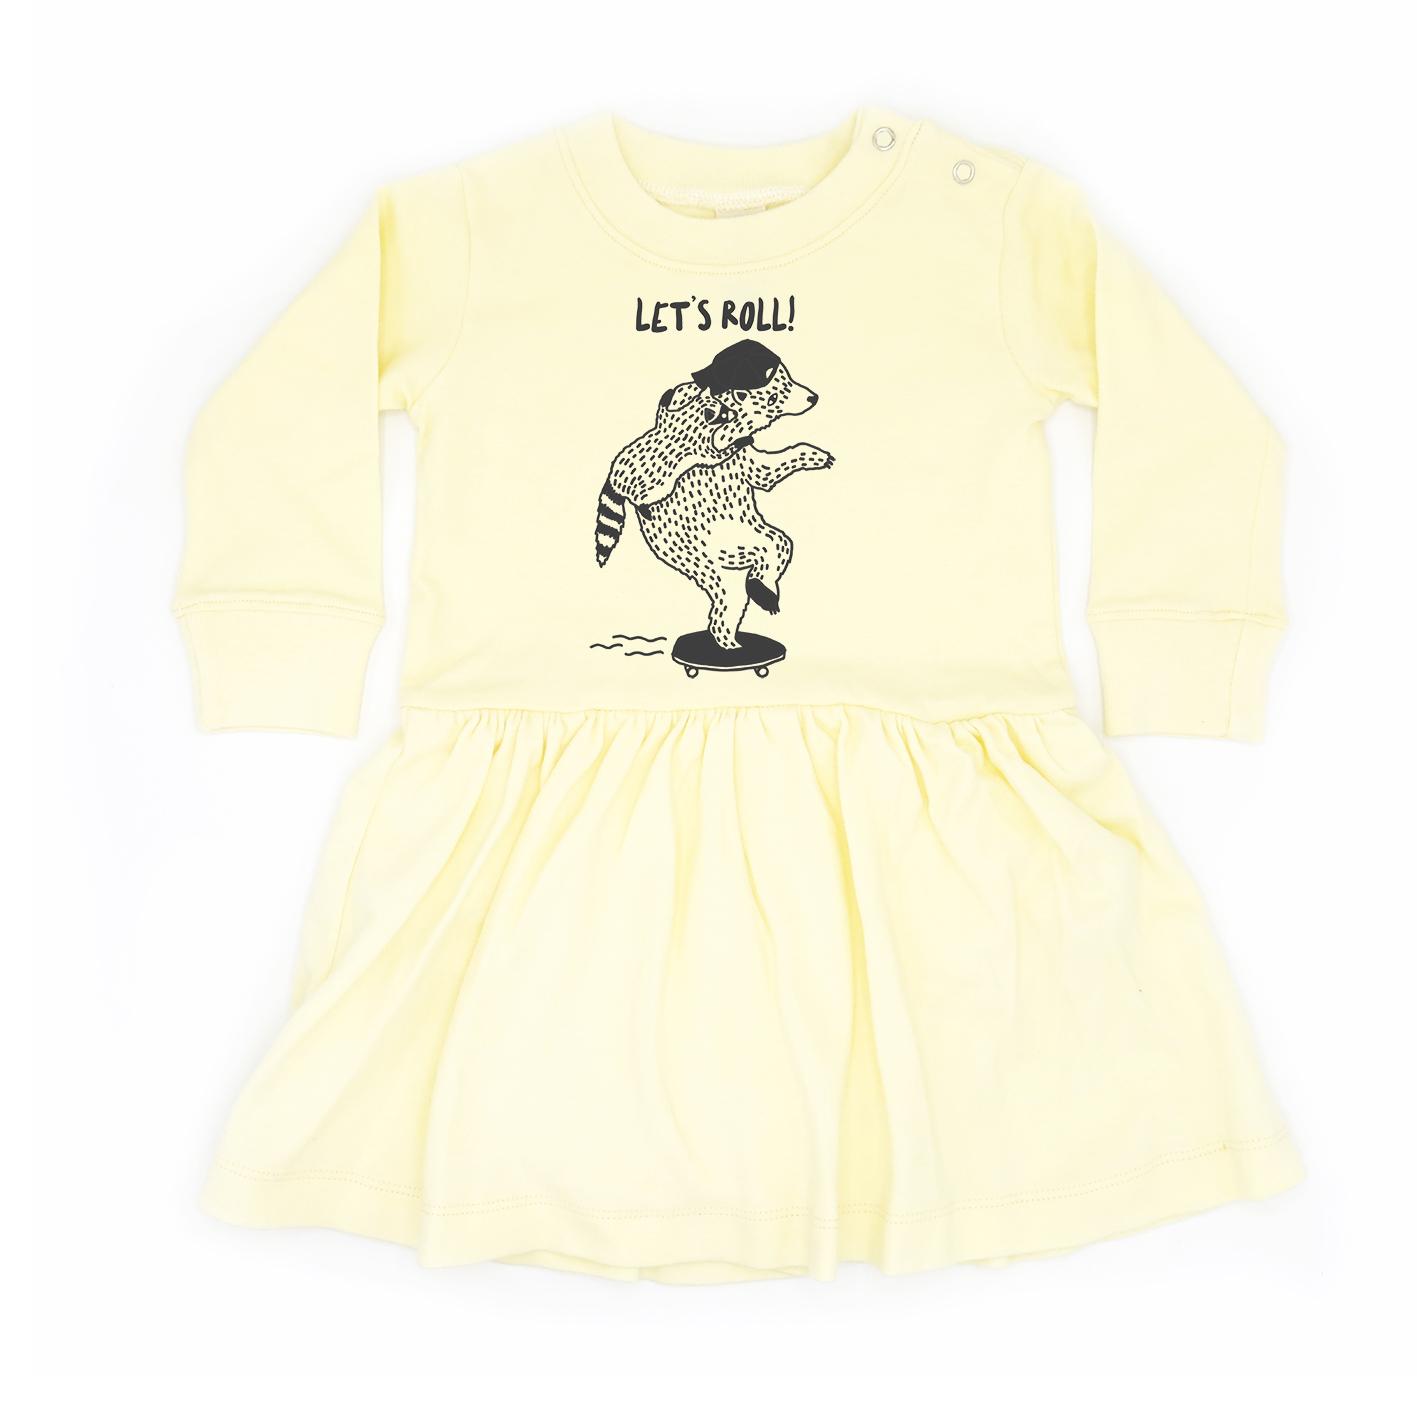 BABY 0-18M [C] LP0157 LET'S ROLL ONESIE SKIRT